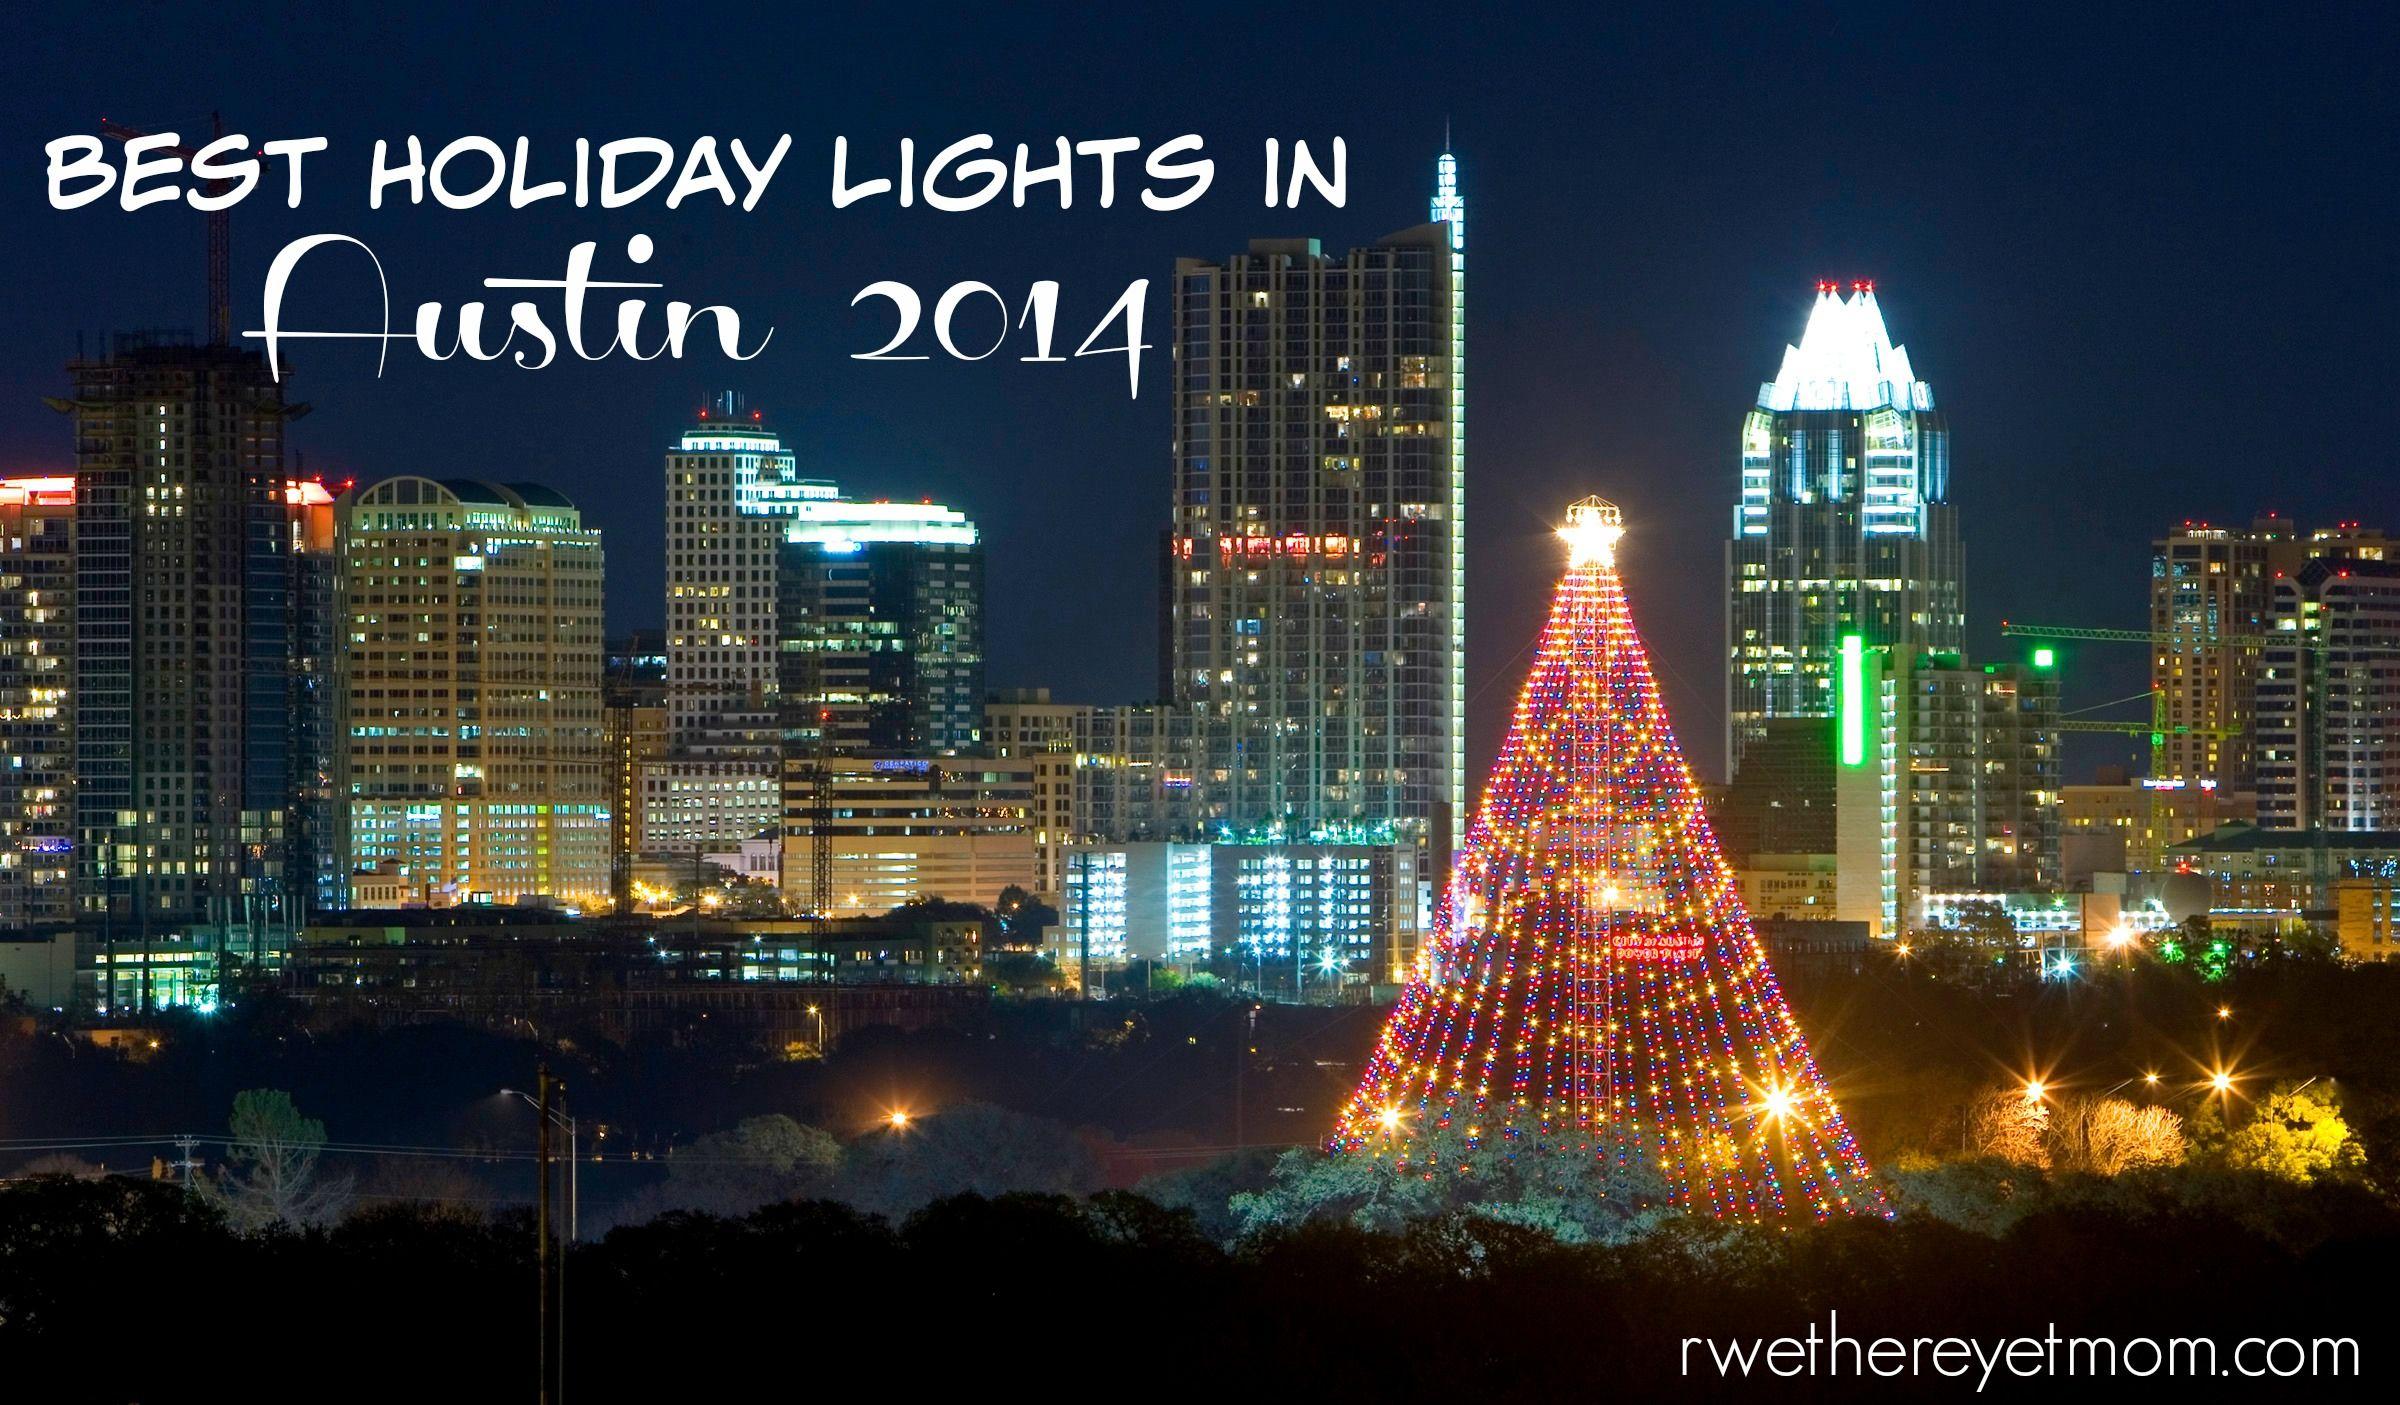 Holiday Light Displays Christmas Lights Austin Tx Holiday Lights Display Austin Events Christmas Lights